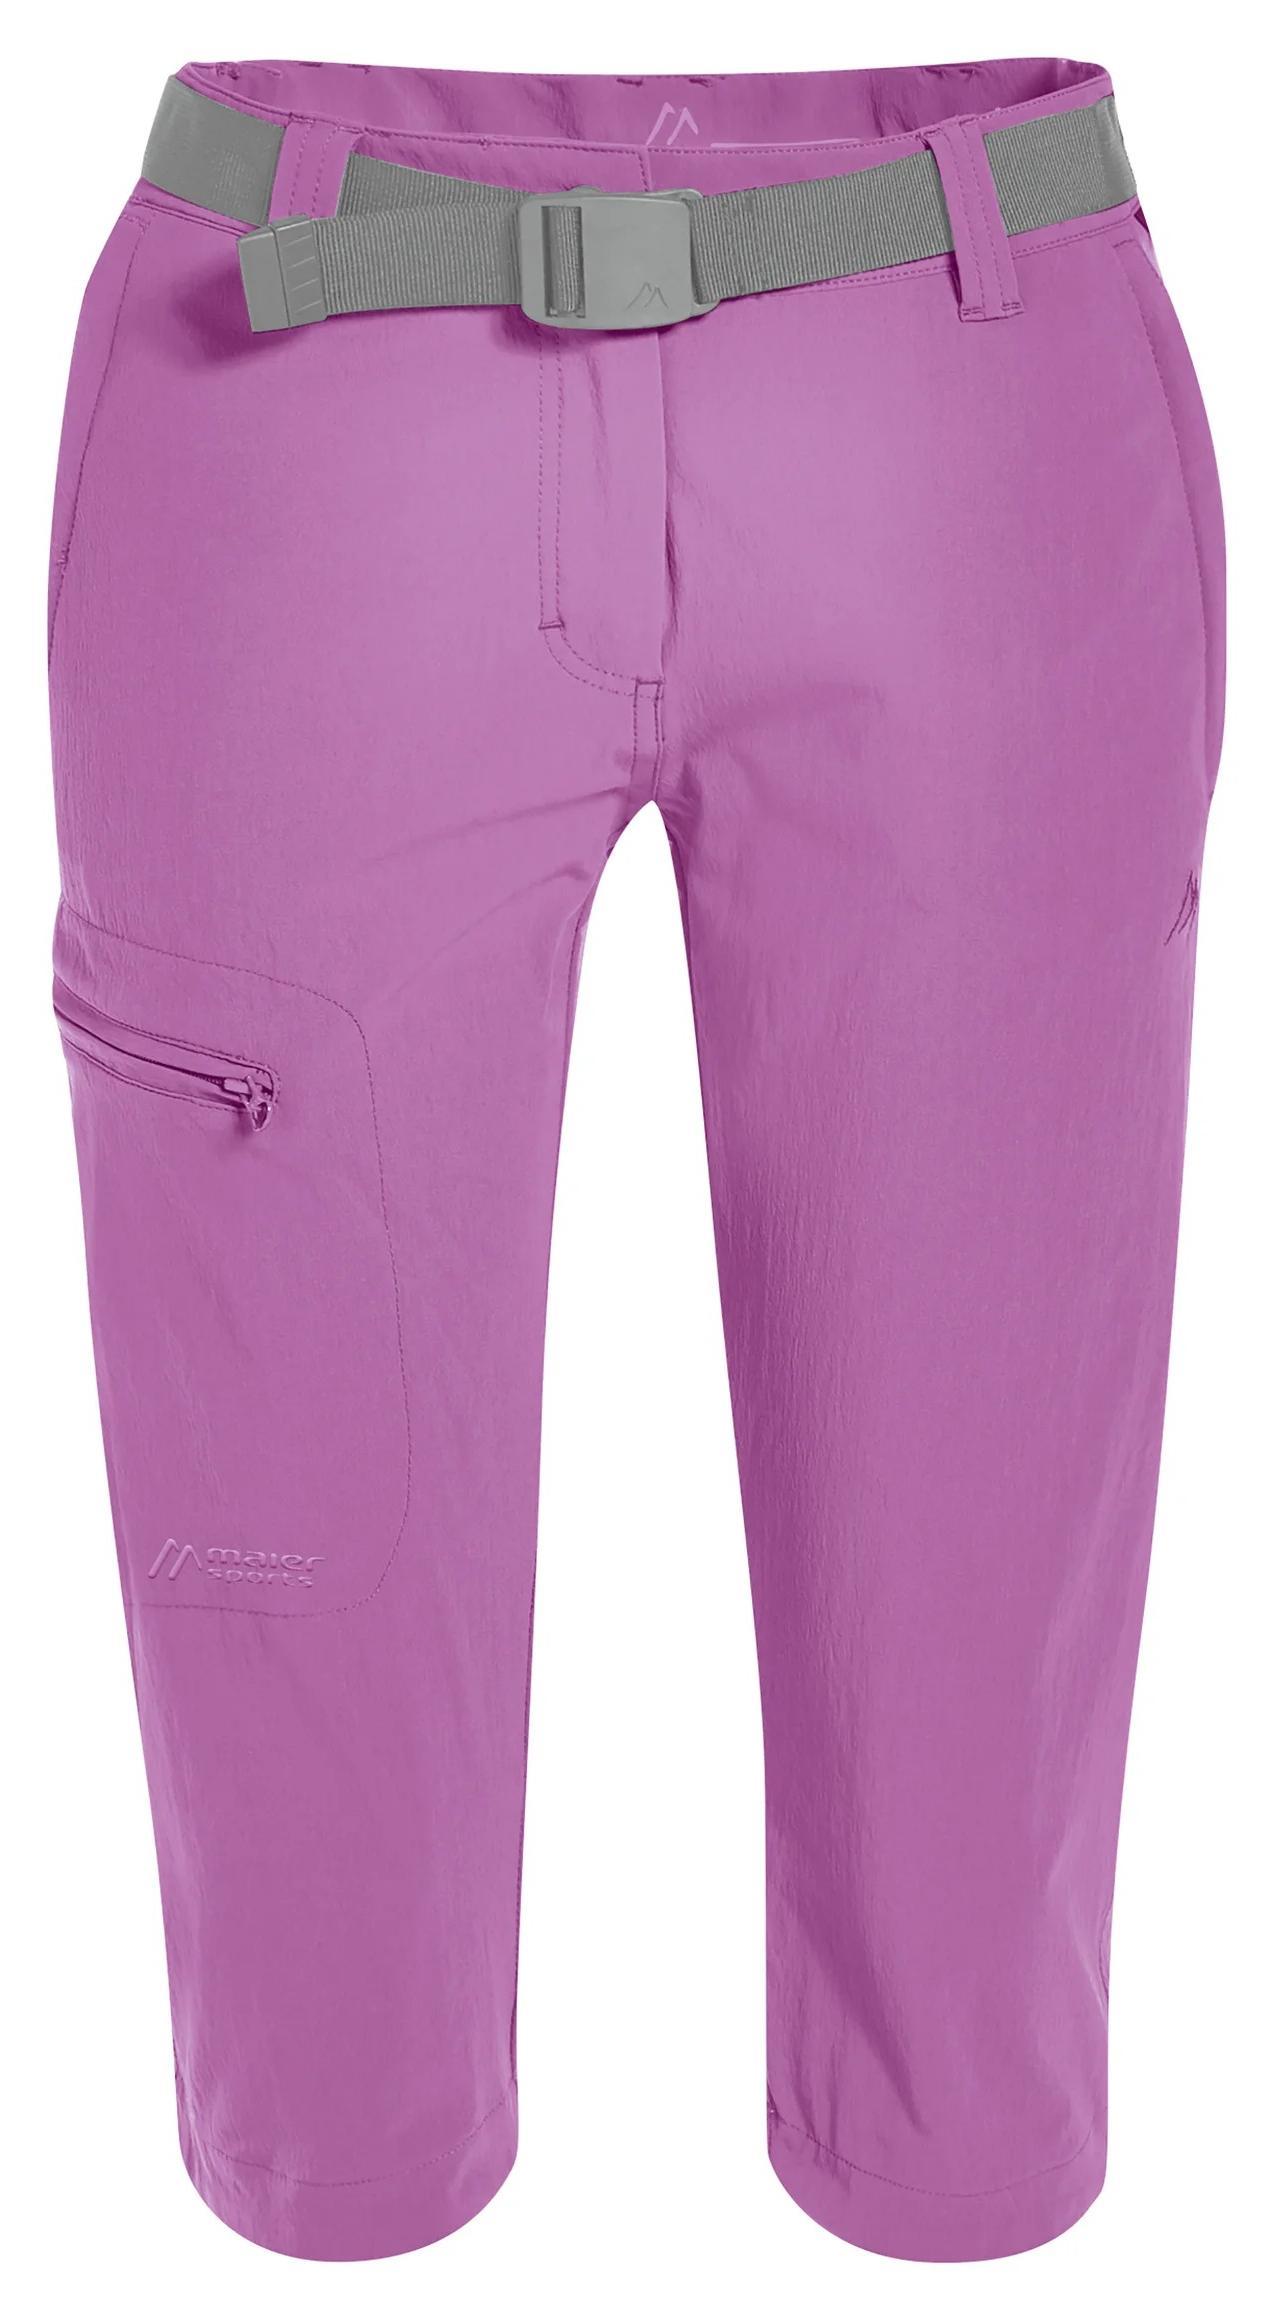 Шорты женские Maier Sports 231007_0143 фиолетовые 42 EU